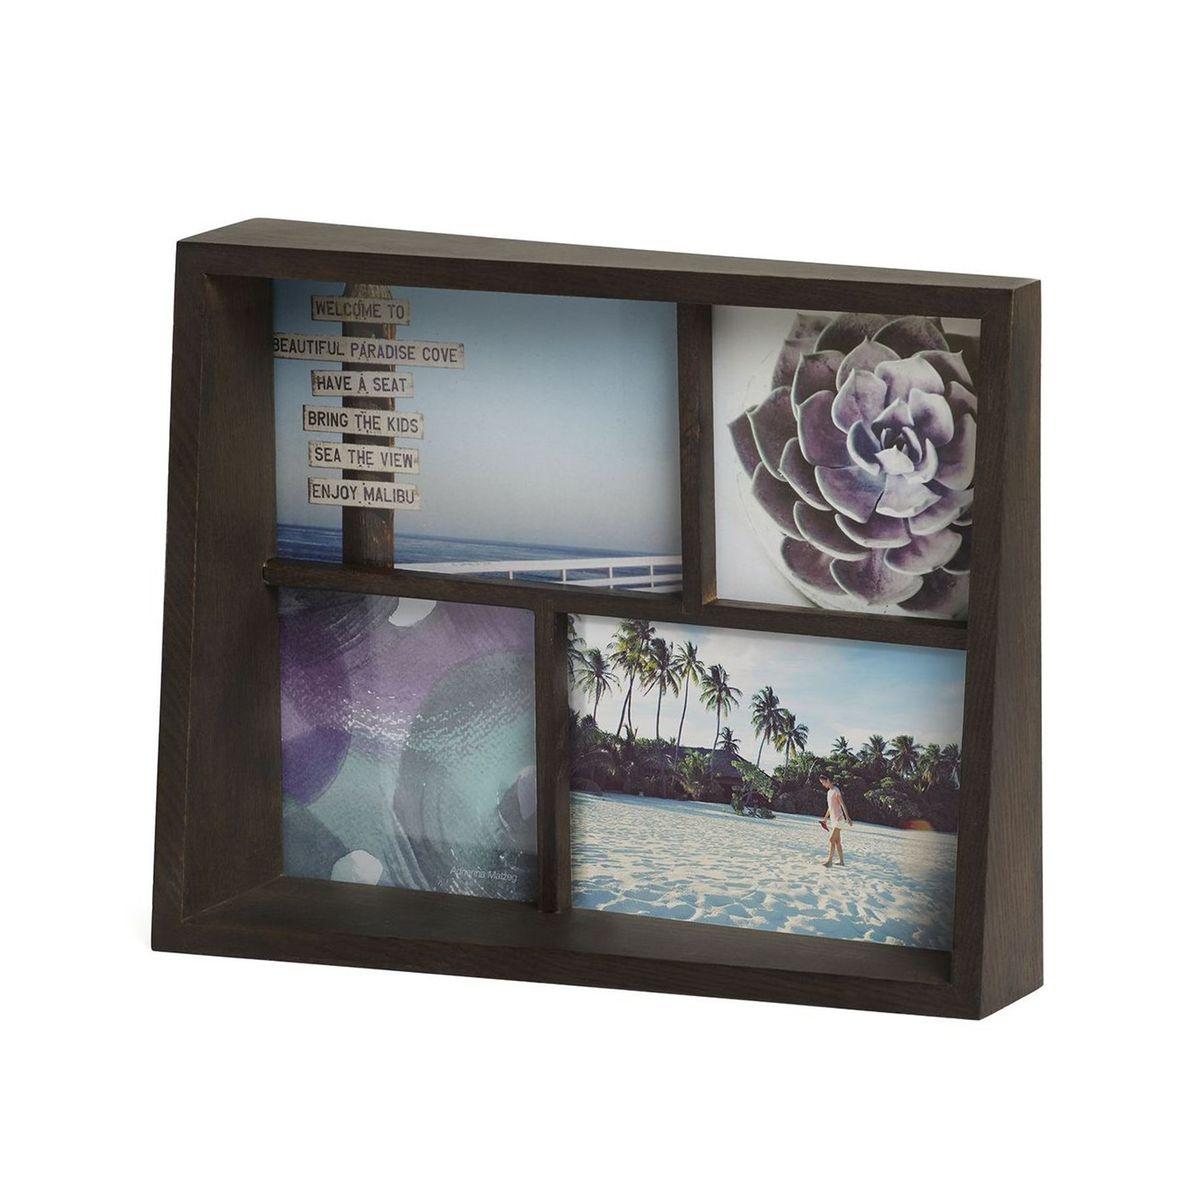 Cadre Edge Multi Desk Noyer pour 4 Photos Umbra